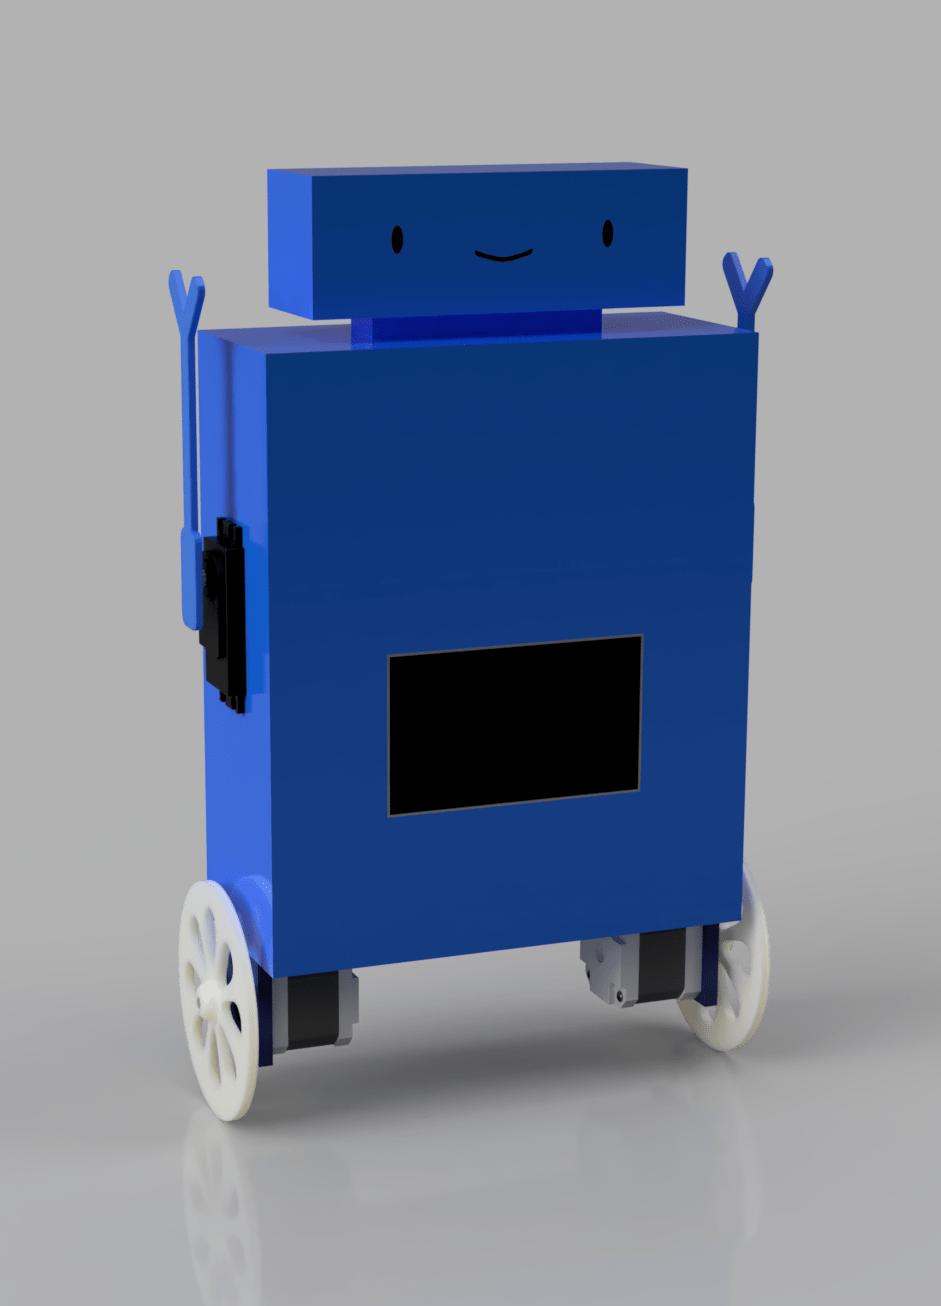 Balancing robot – Ben James